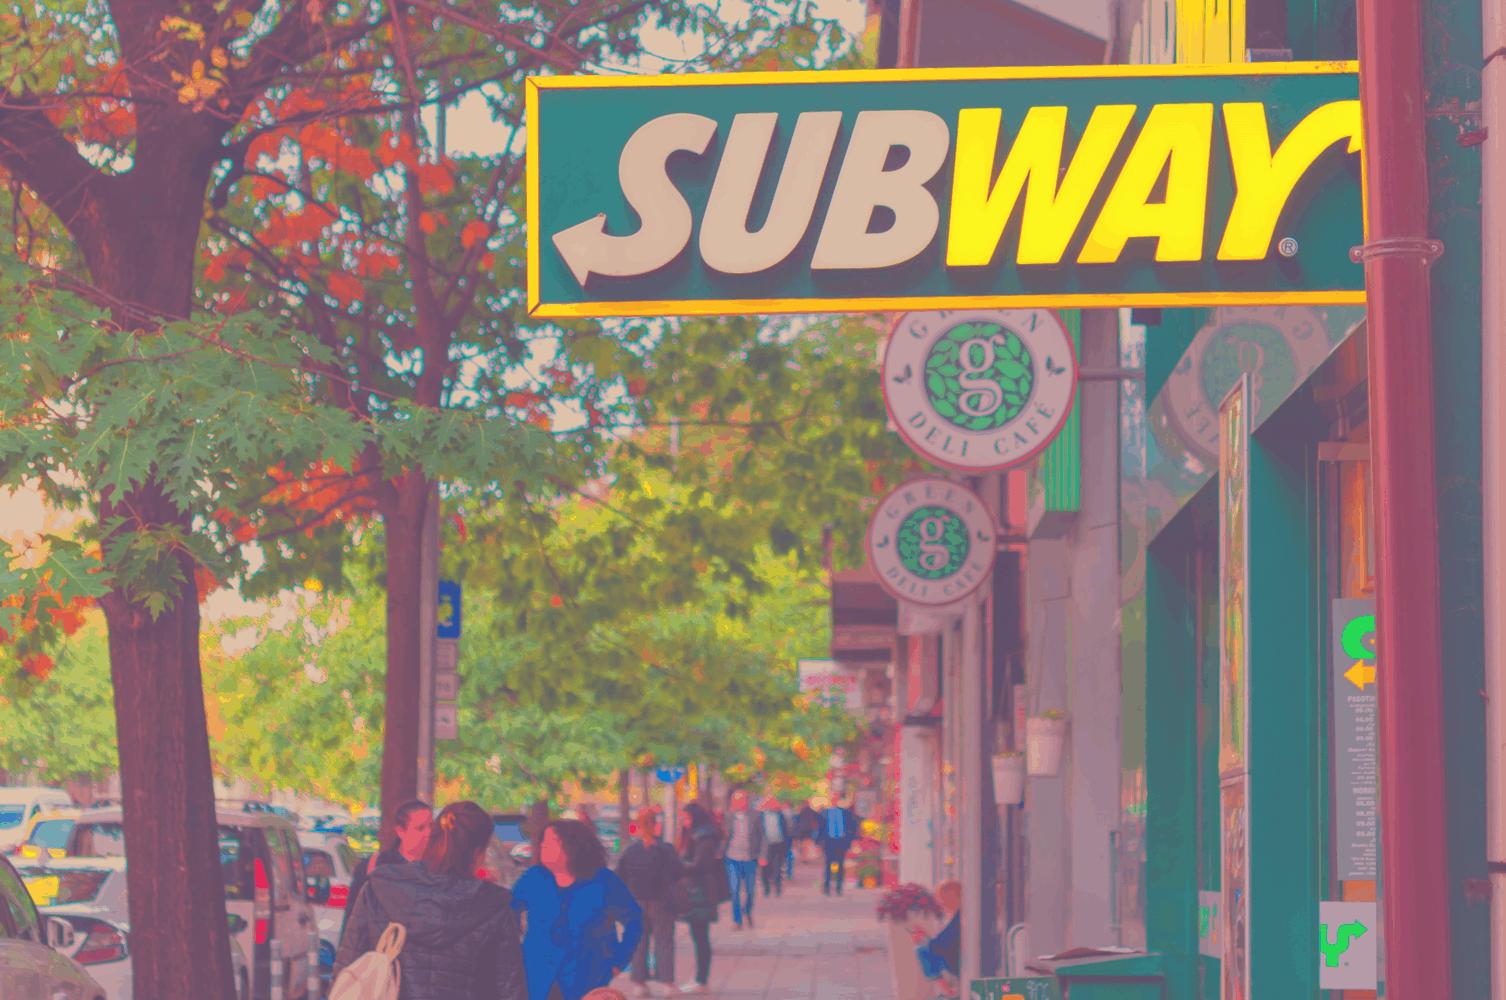 Is The Subway Veggie Patty Vegan